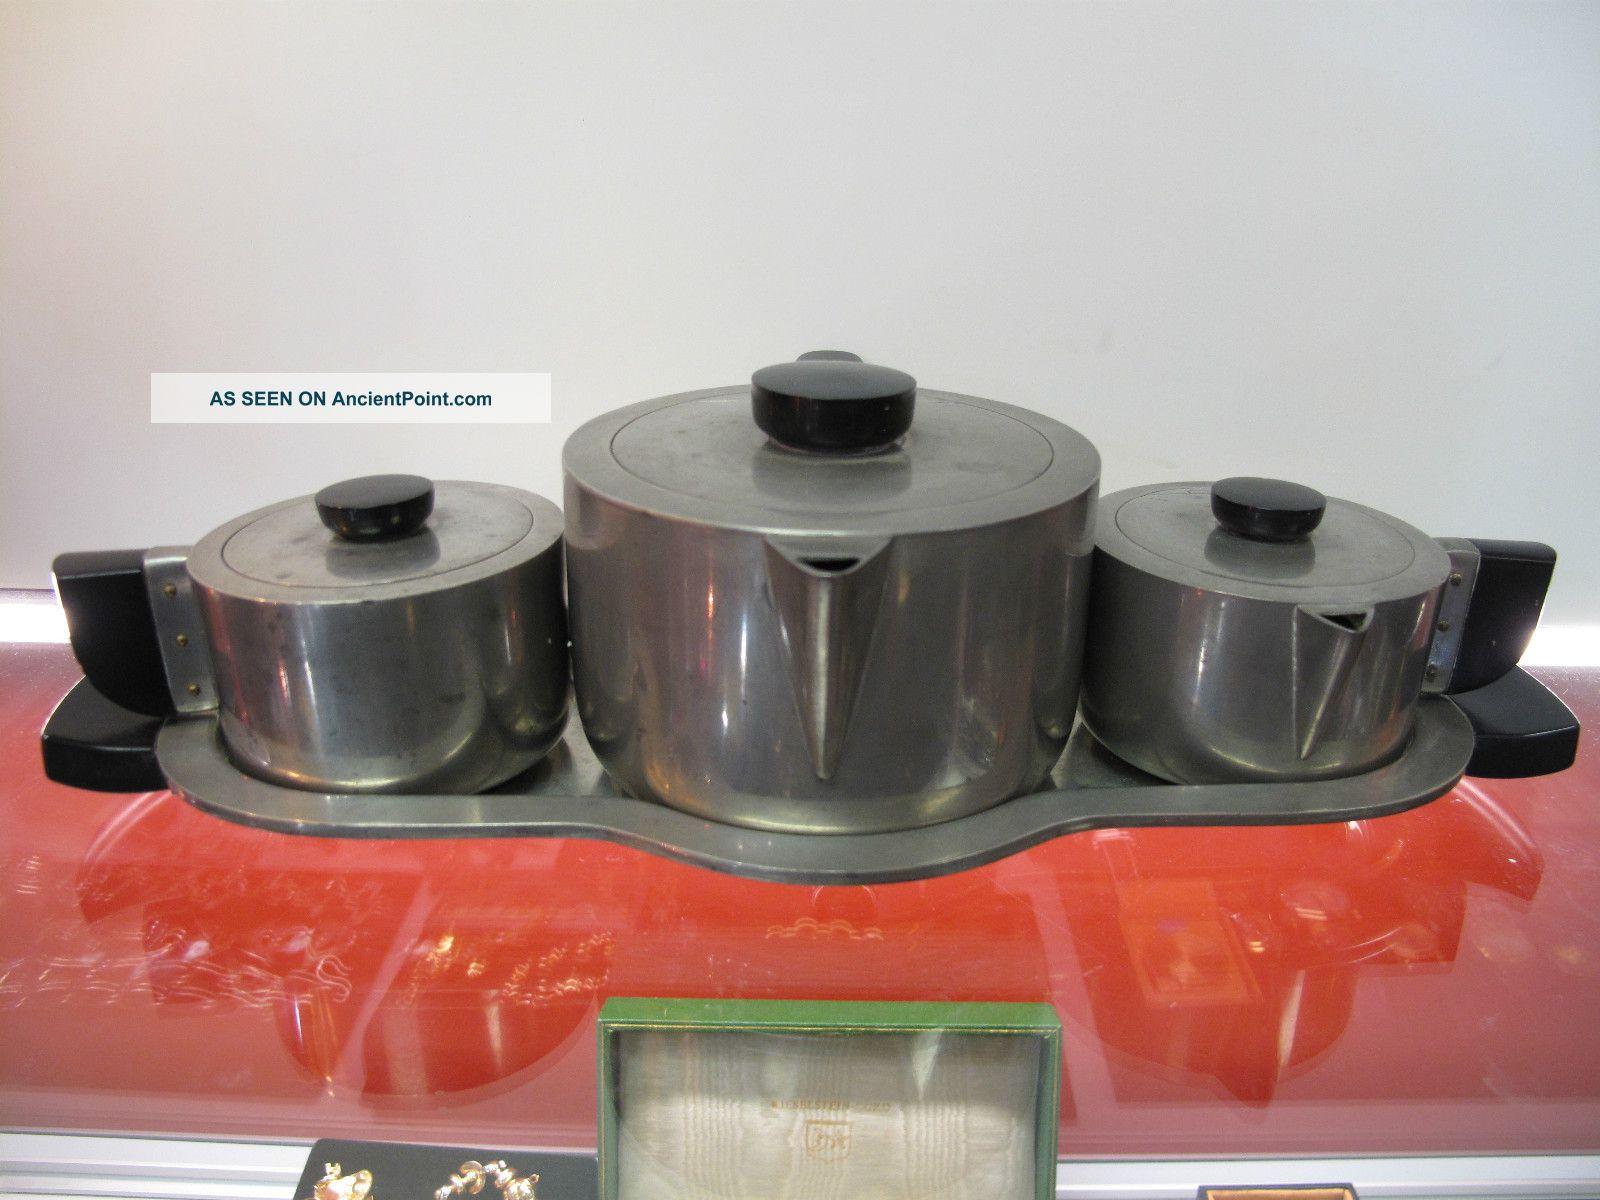 Jean Theobald Rare Art Deco Tea Set By Wilcox Circa 1930s Silver Eames Era Tea/Coffee Pots & Sets photo